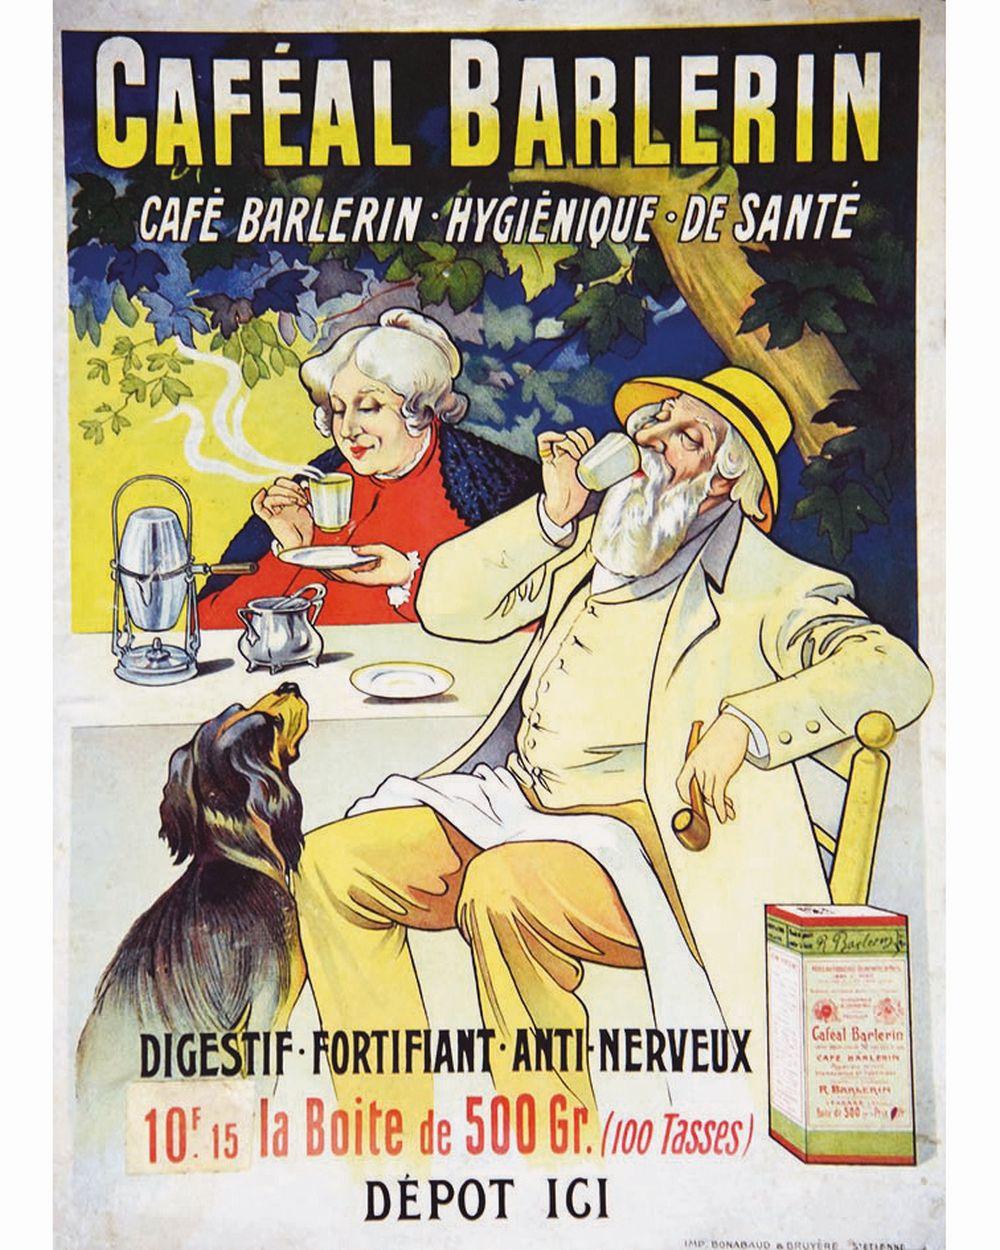 Caféal Barlerin Café Barlerin - Hygiénique de santé - Digestif, fortifiant, anti-nerveux     vers 1900  Tarare (Rhône)